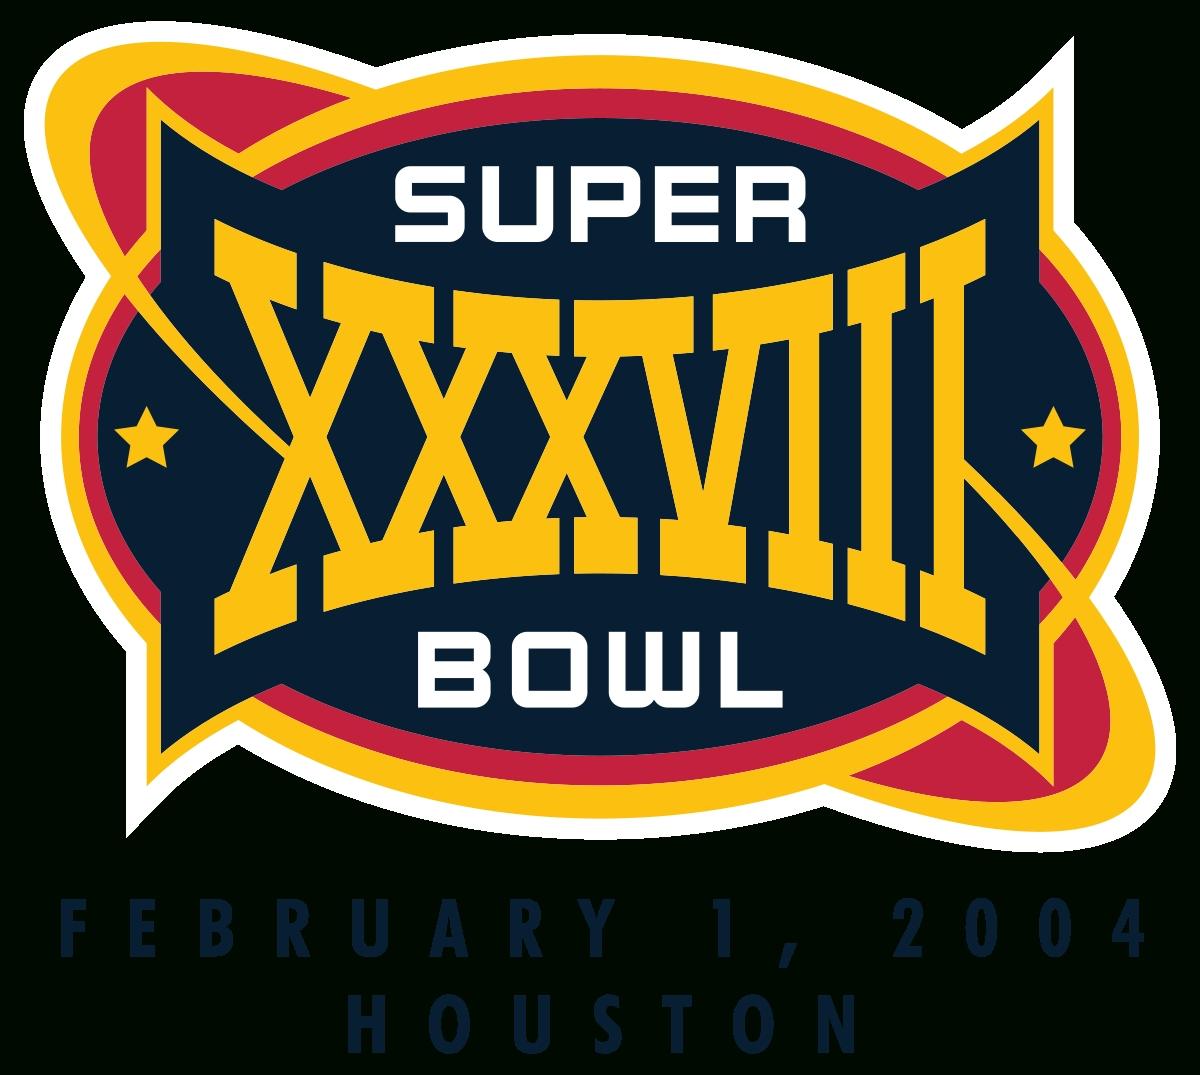 Super Bowl Xxxviii - Wikipedia within Super Bowl Mvp Vote Text Number